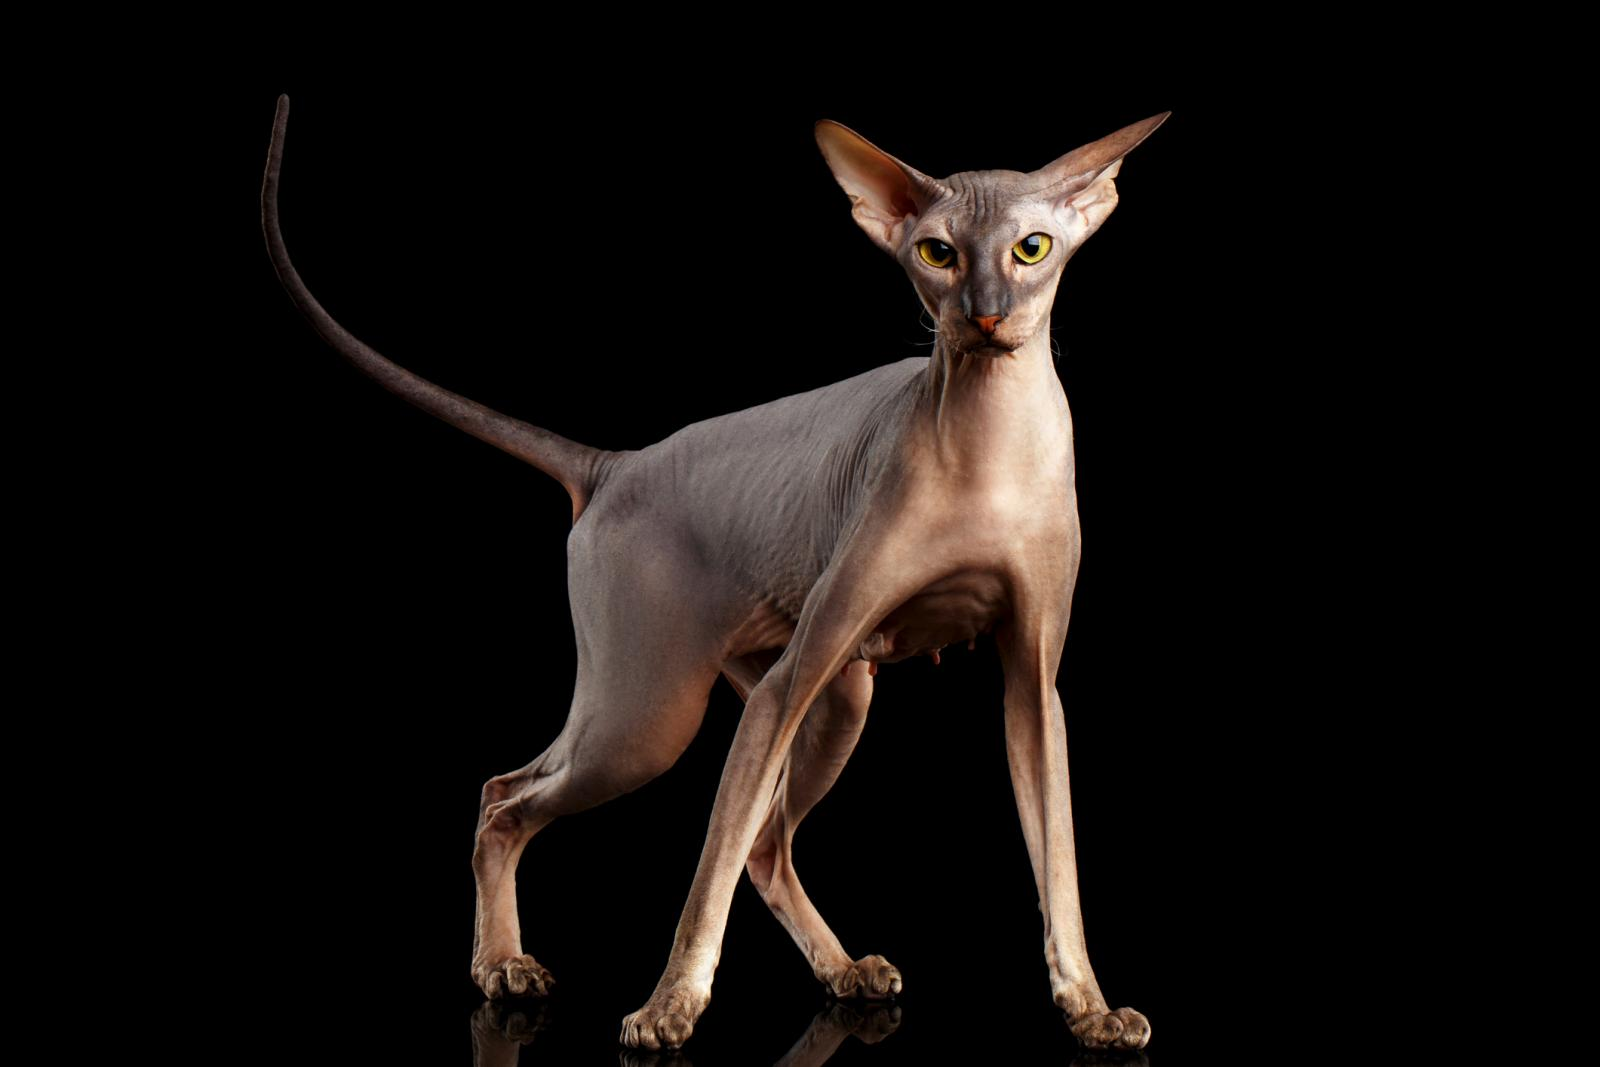 Peterbald hairless cat